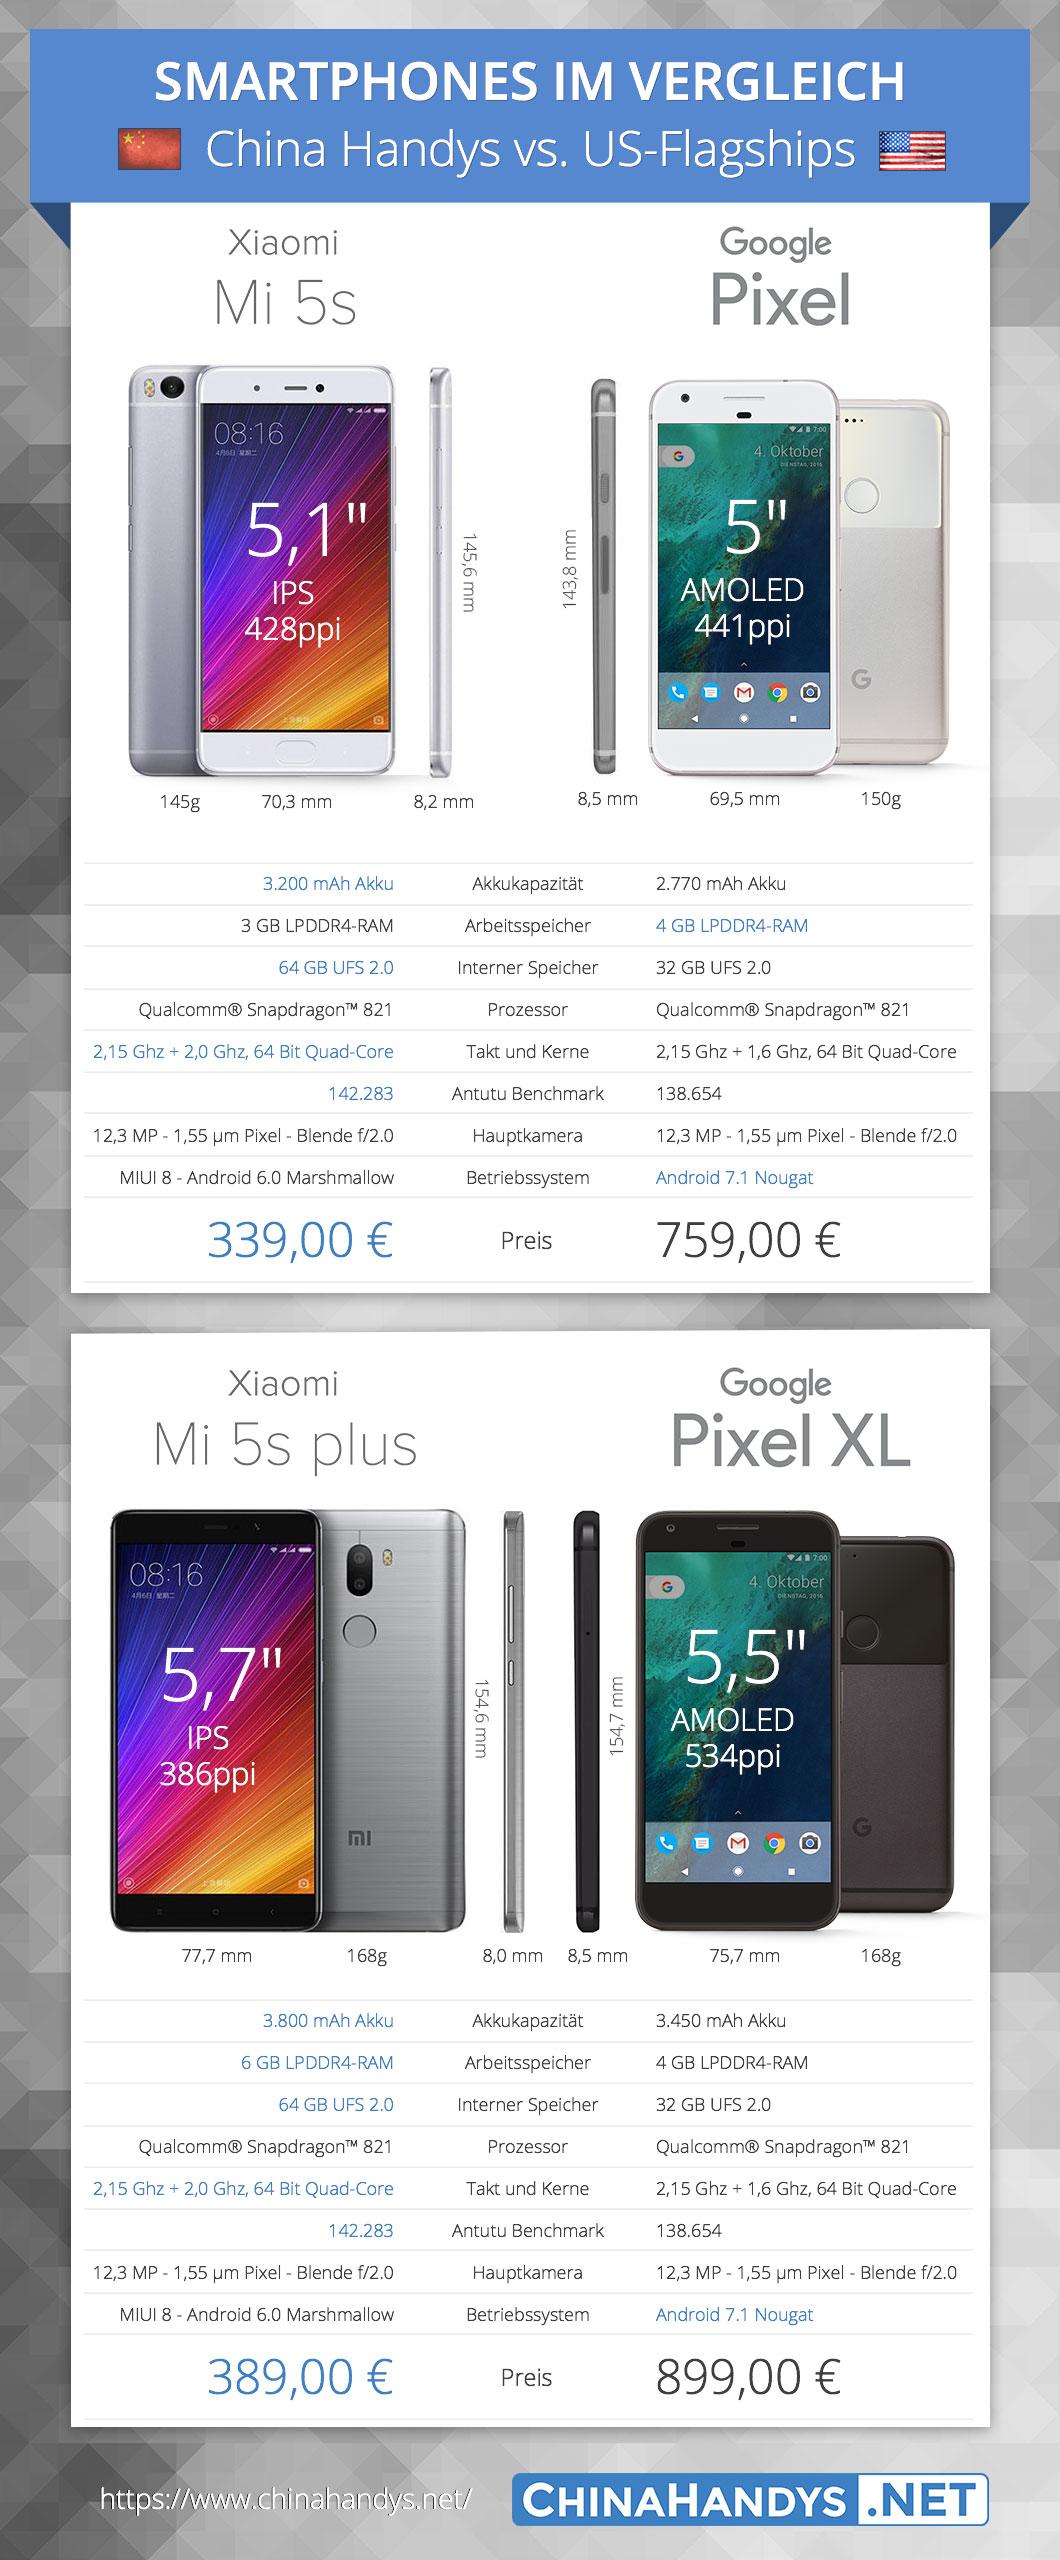 Xiaomi Mi5s vs Google Pixel